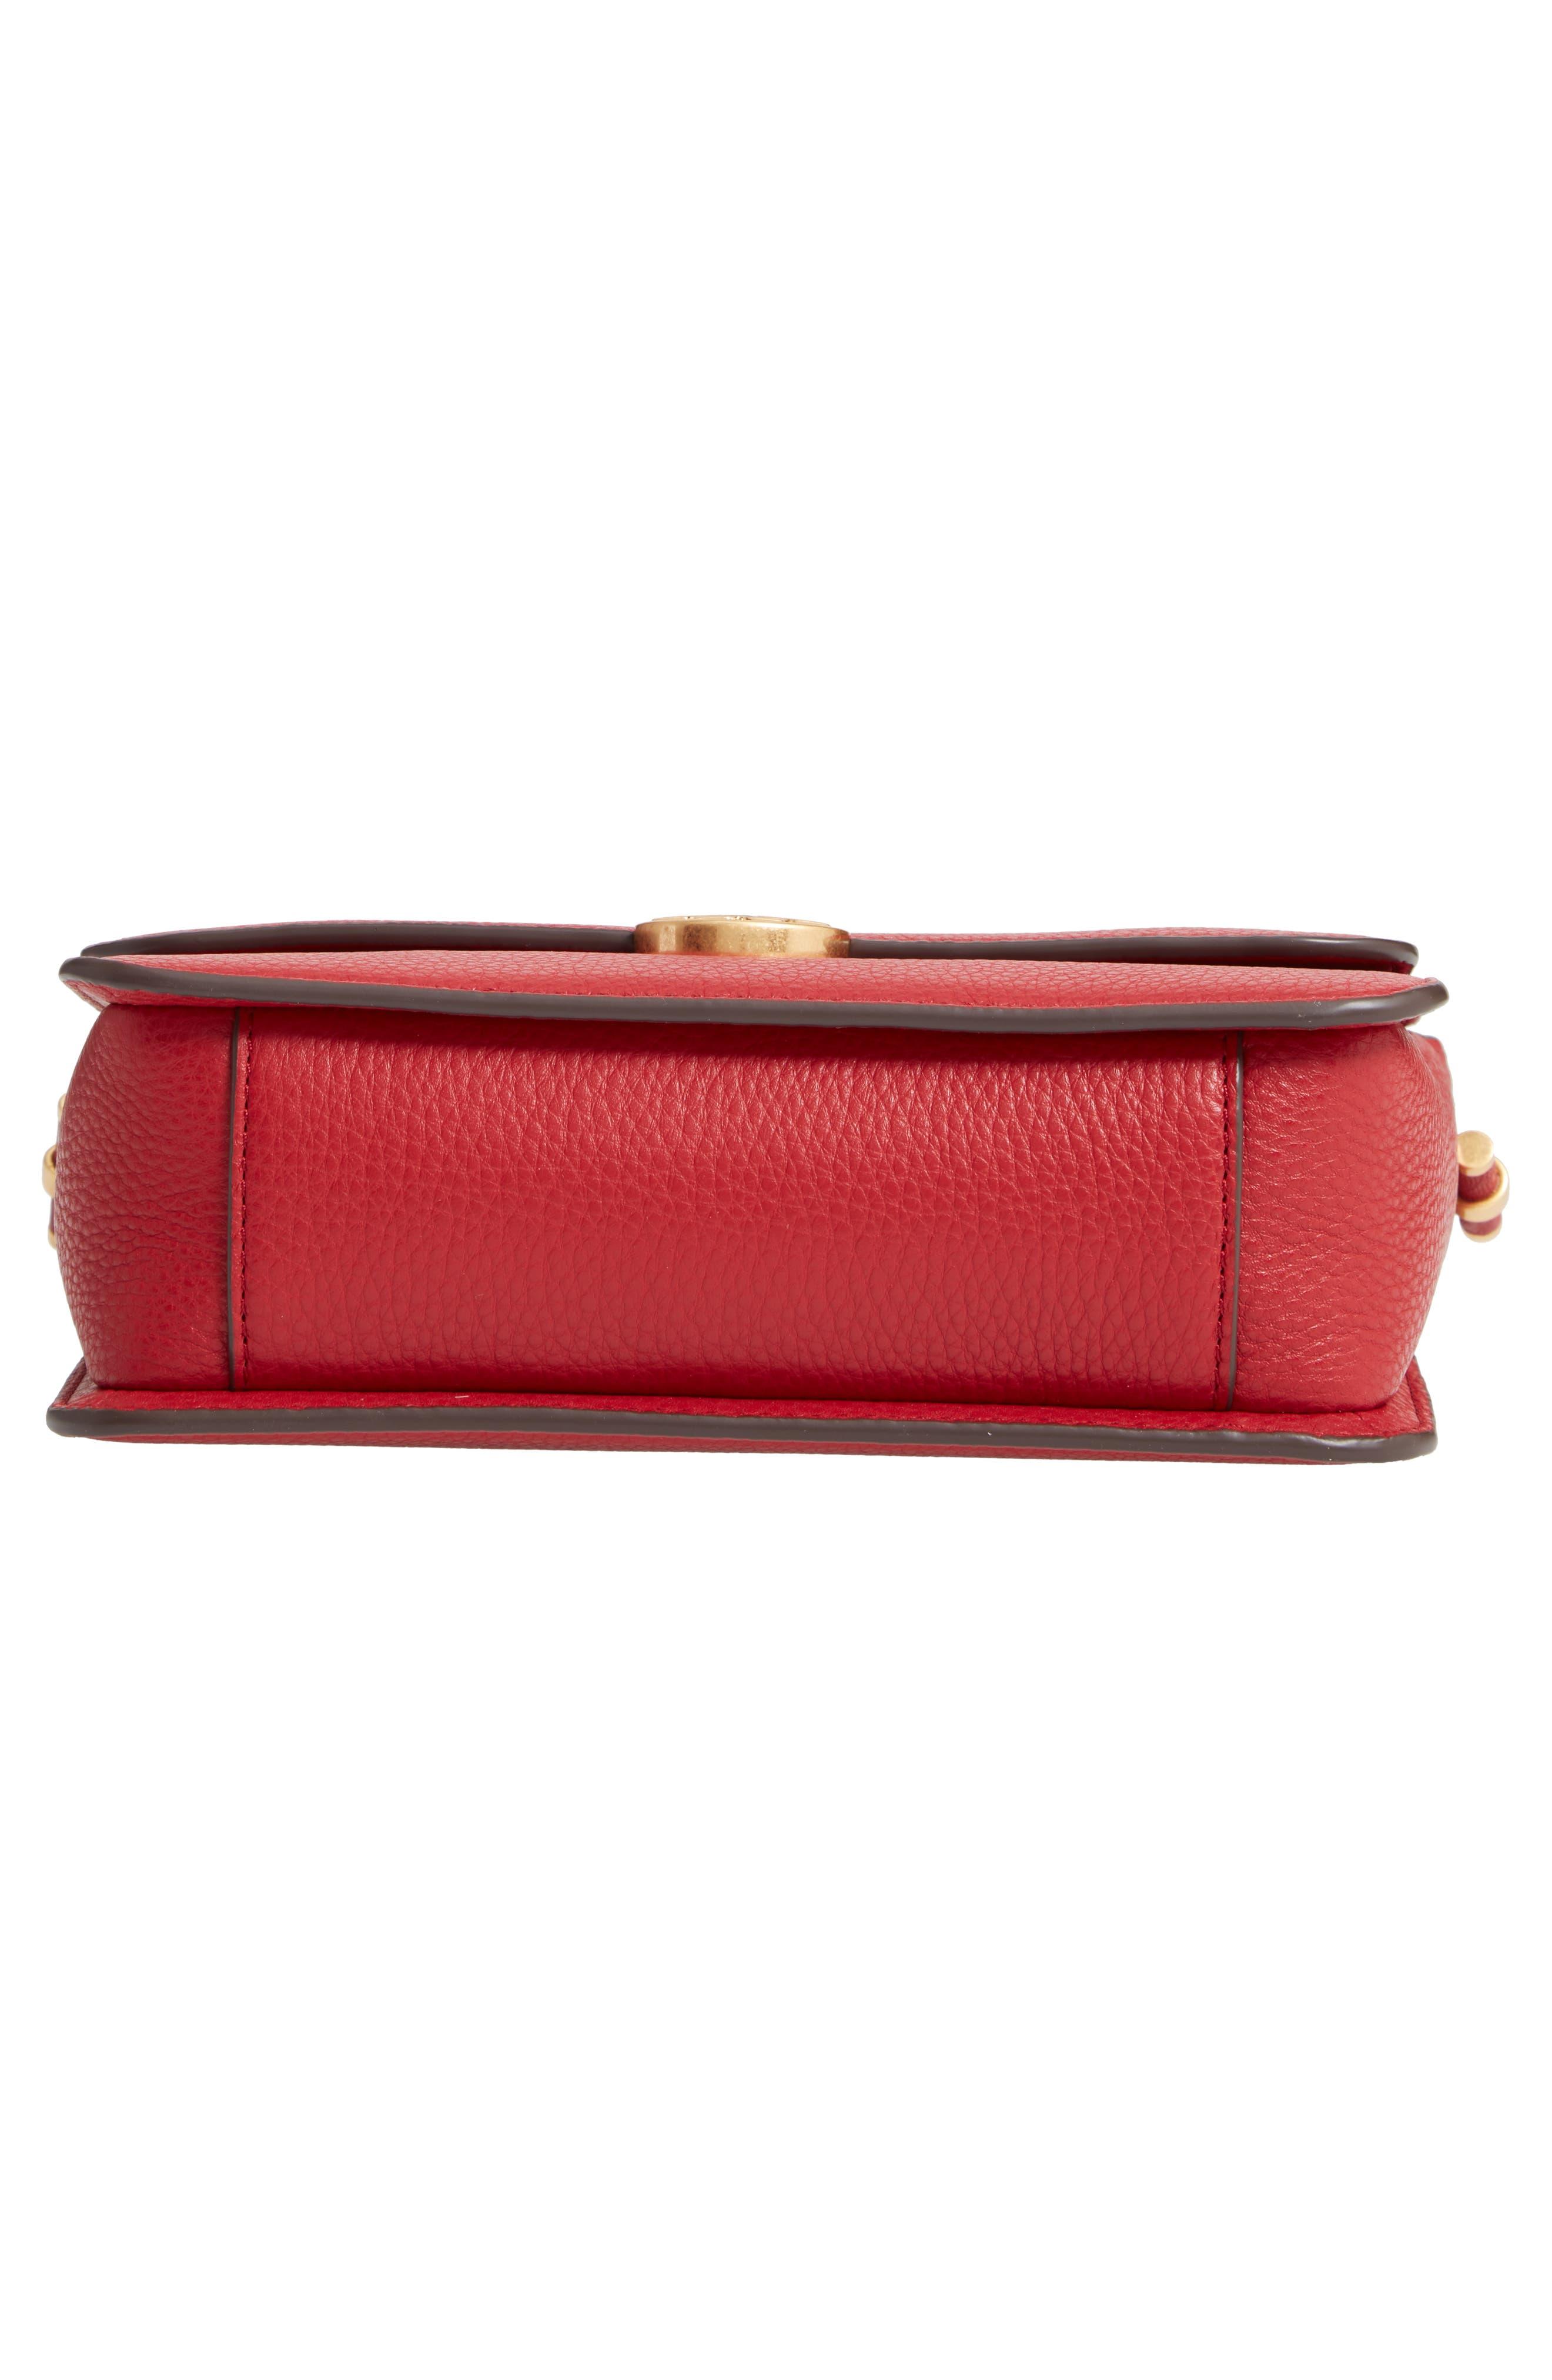 Chelsea Leather Crossbody Bag,                             Alternate thumbnail 6, color,                             REDSTONE